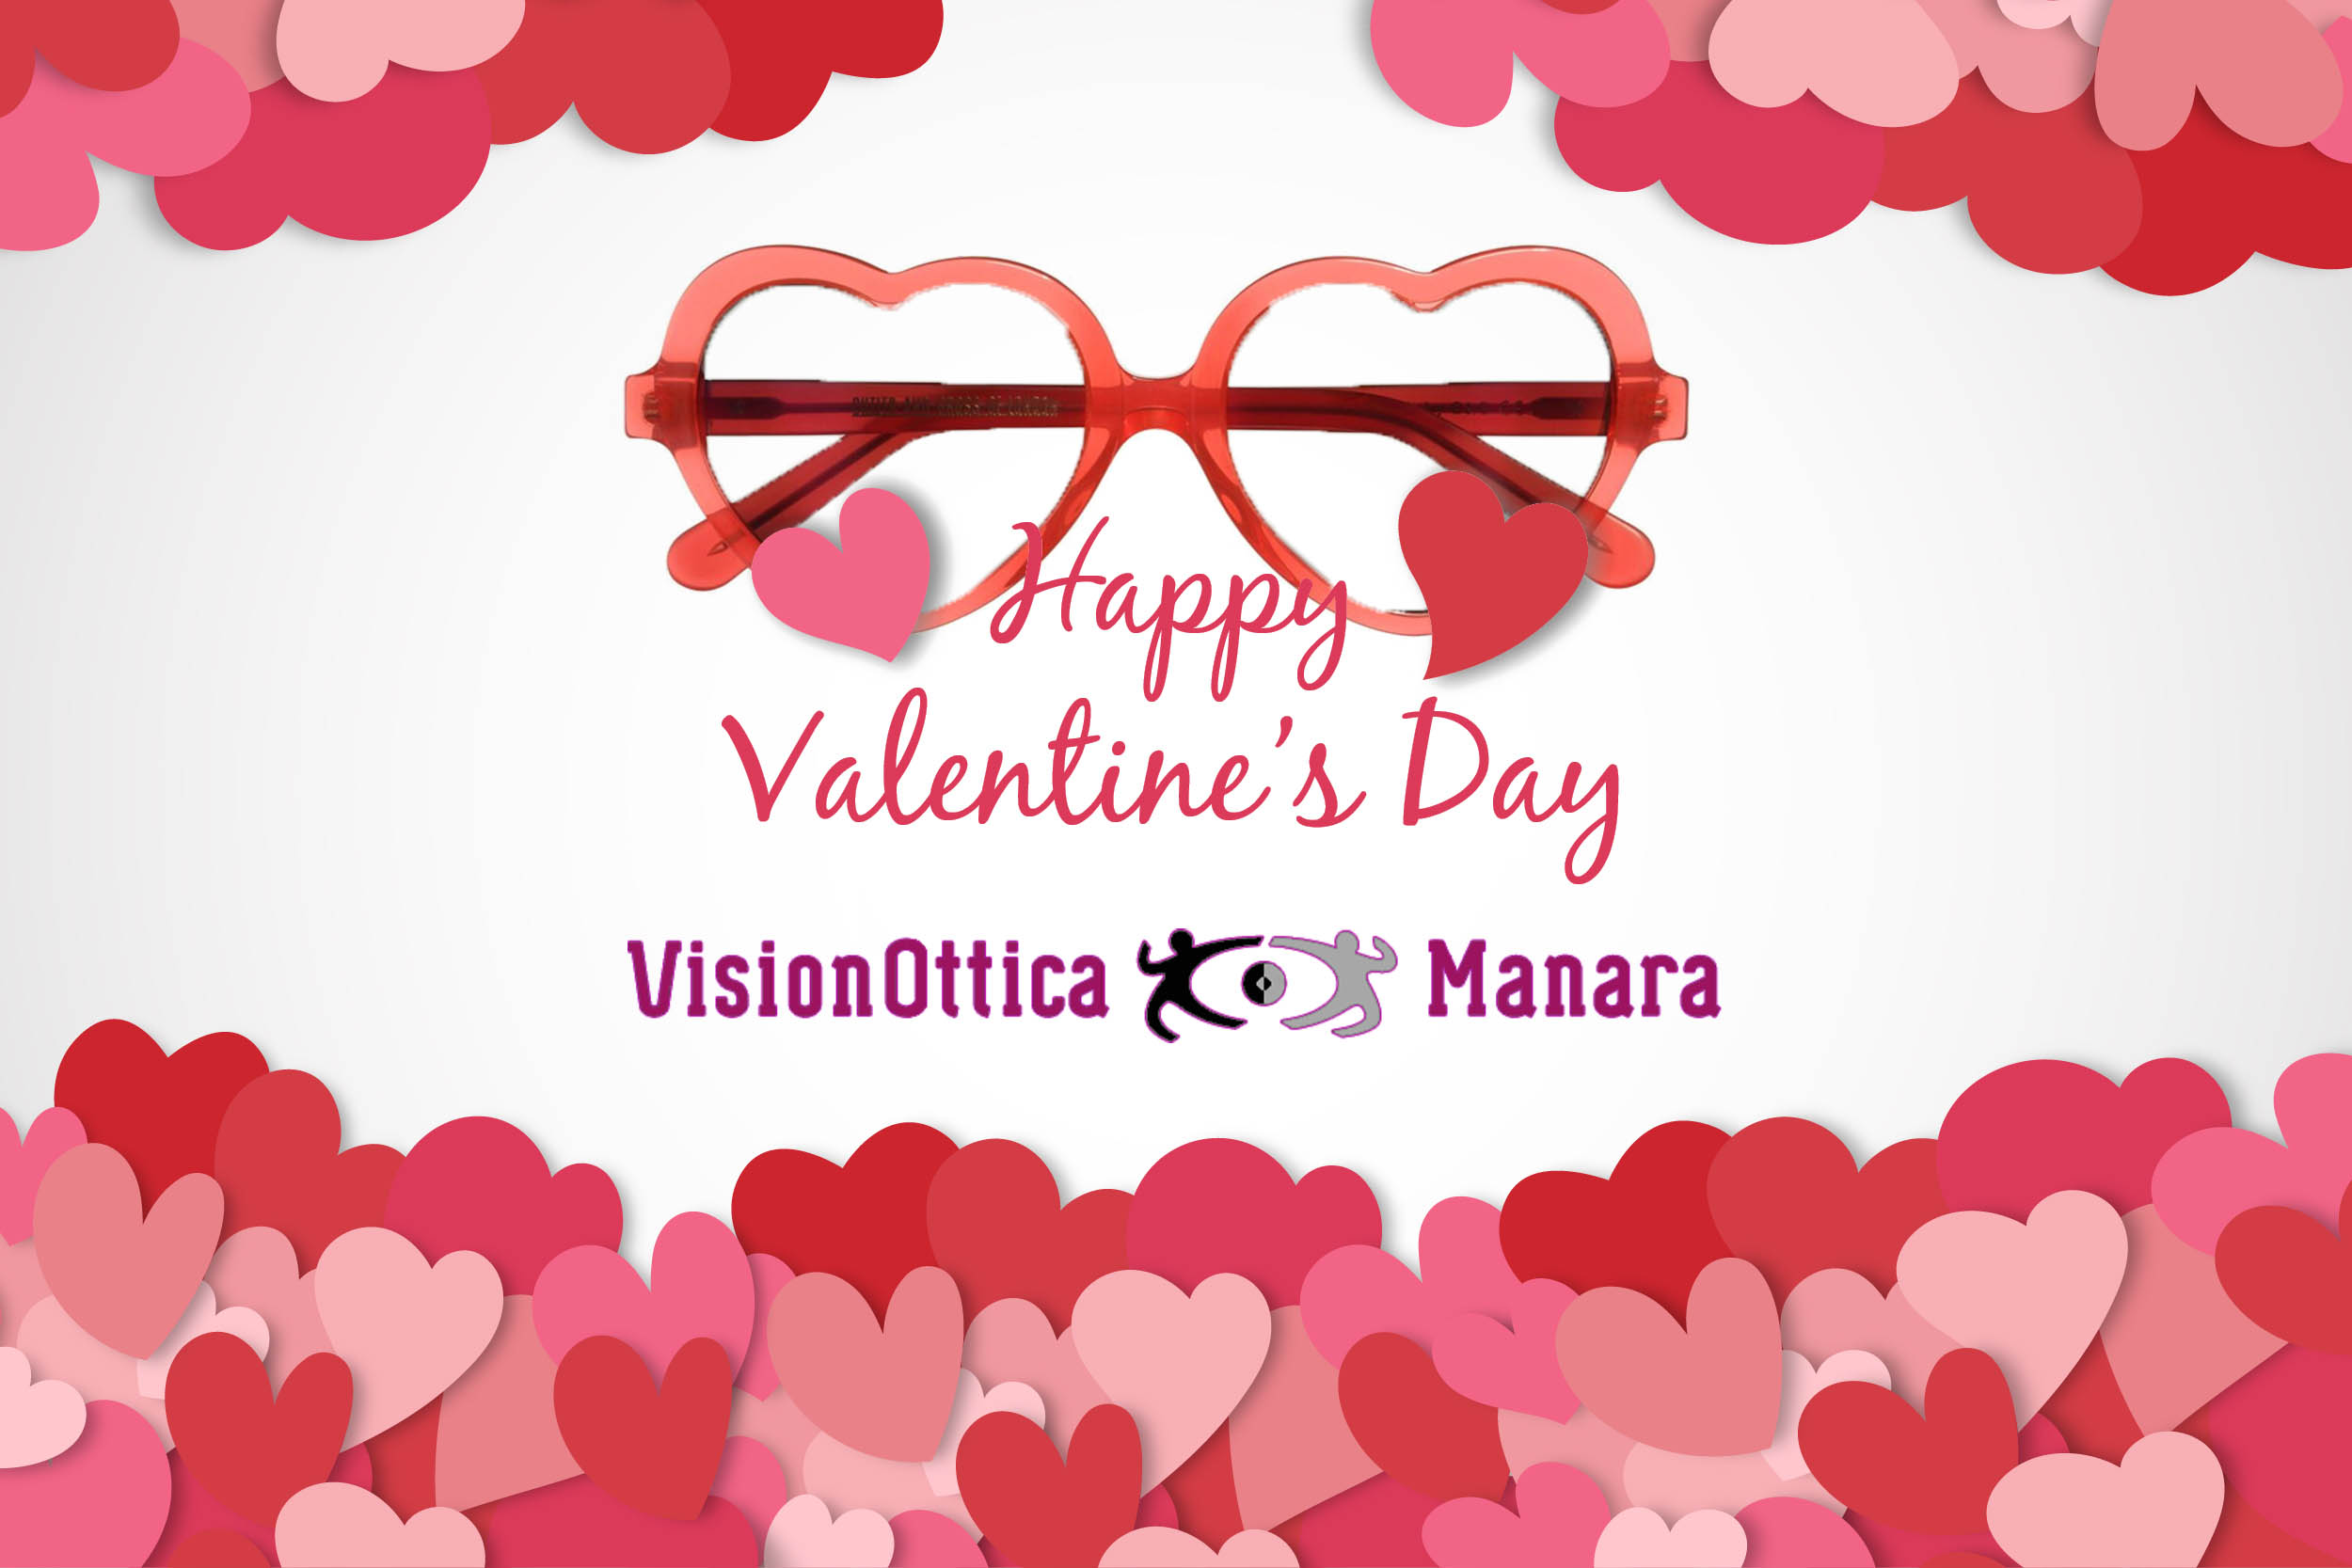 San Valentine day Vision Ottica Manara